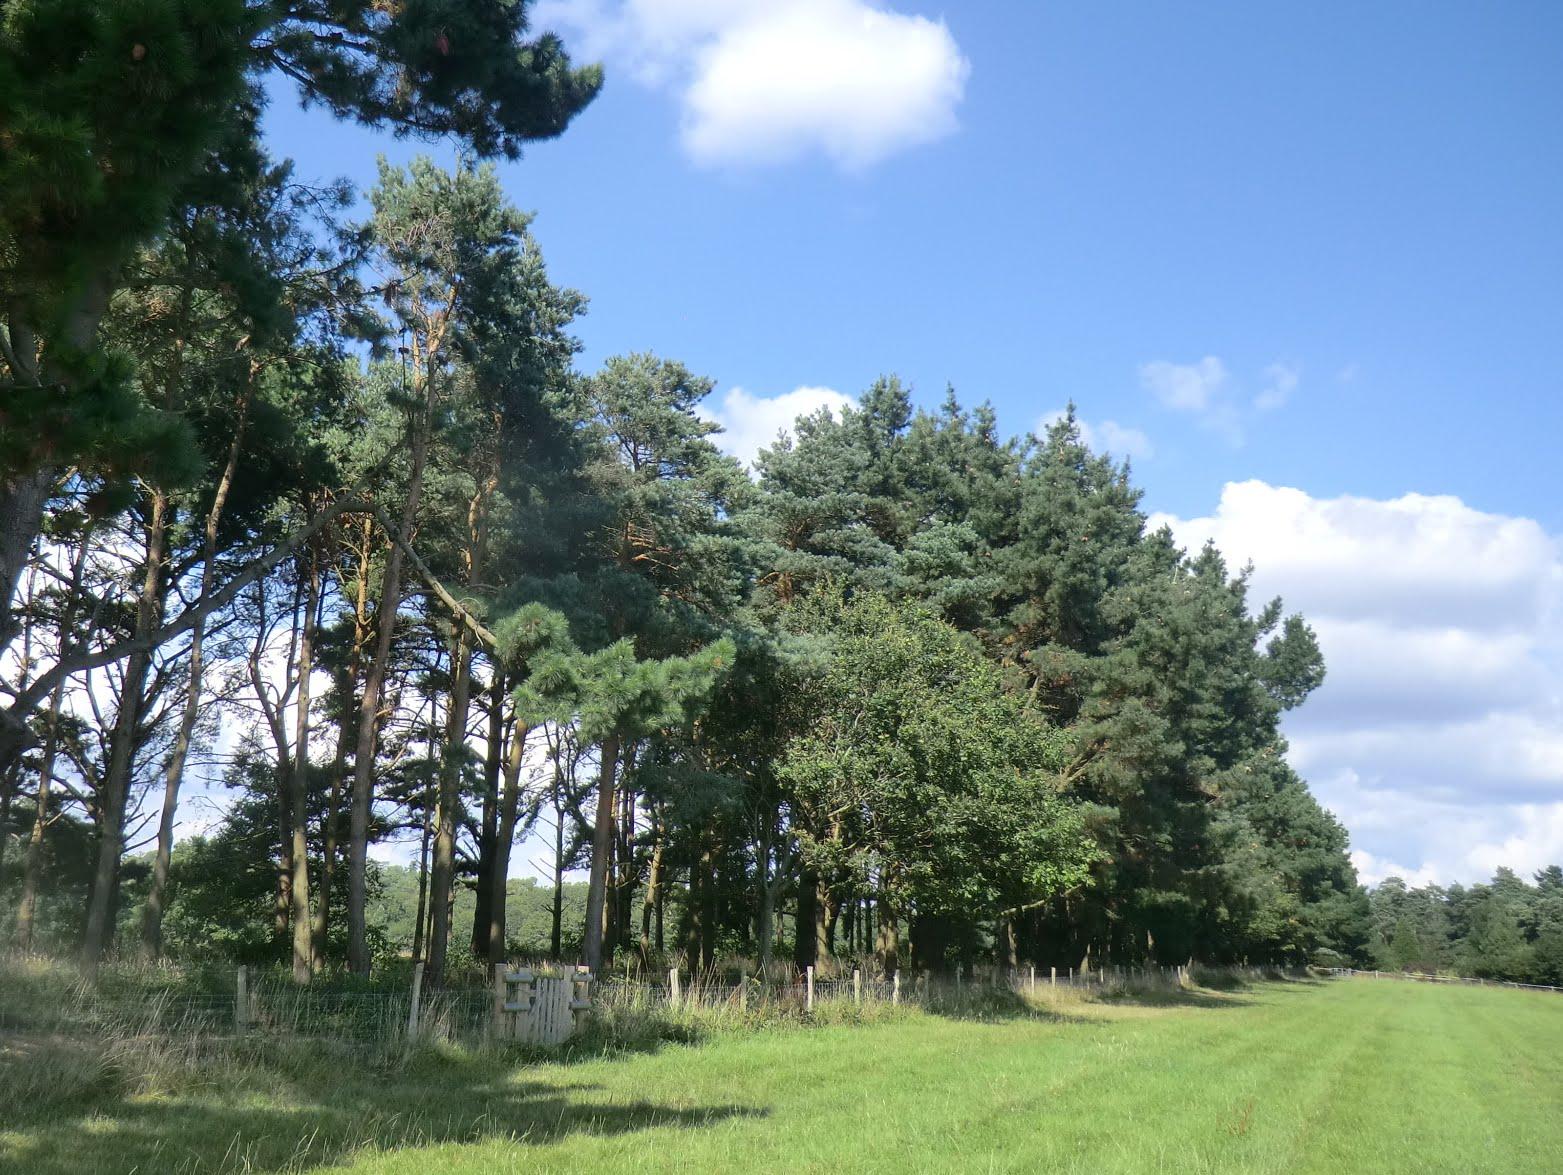 CIMG4118 Conifer plantation